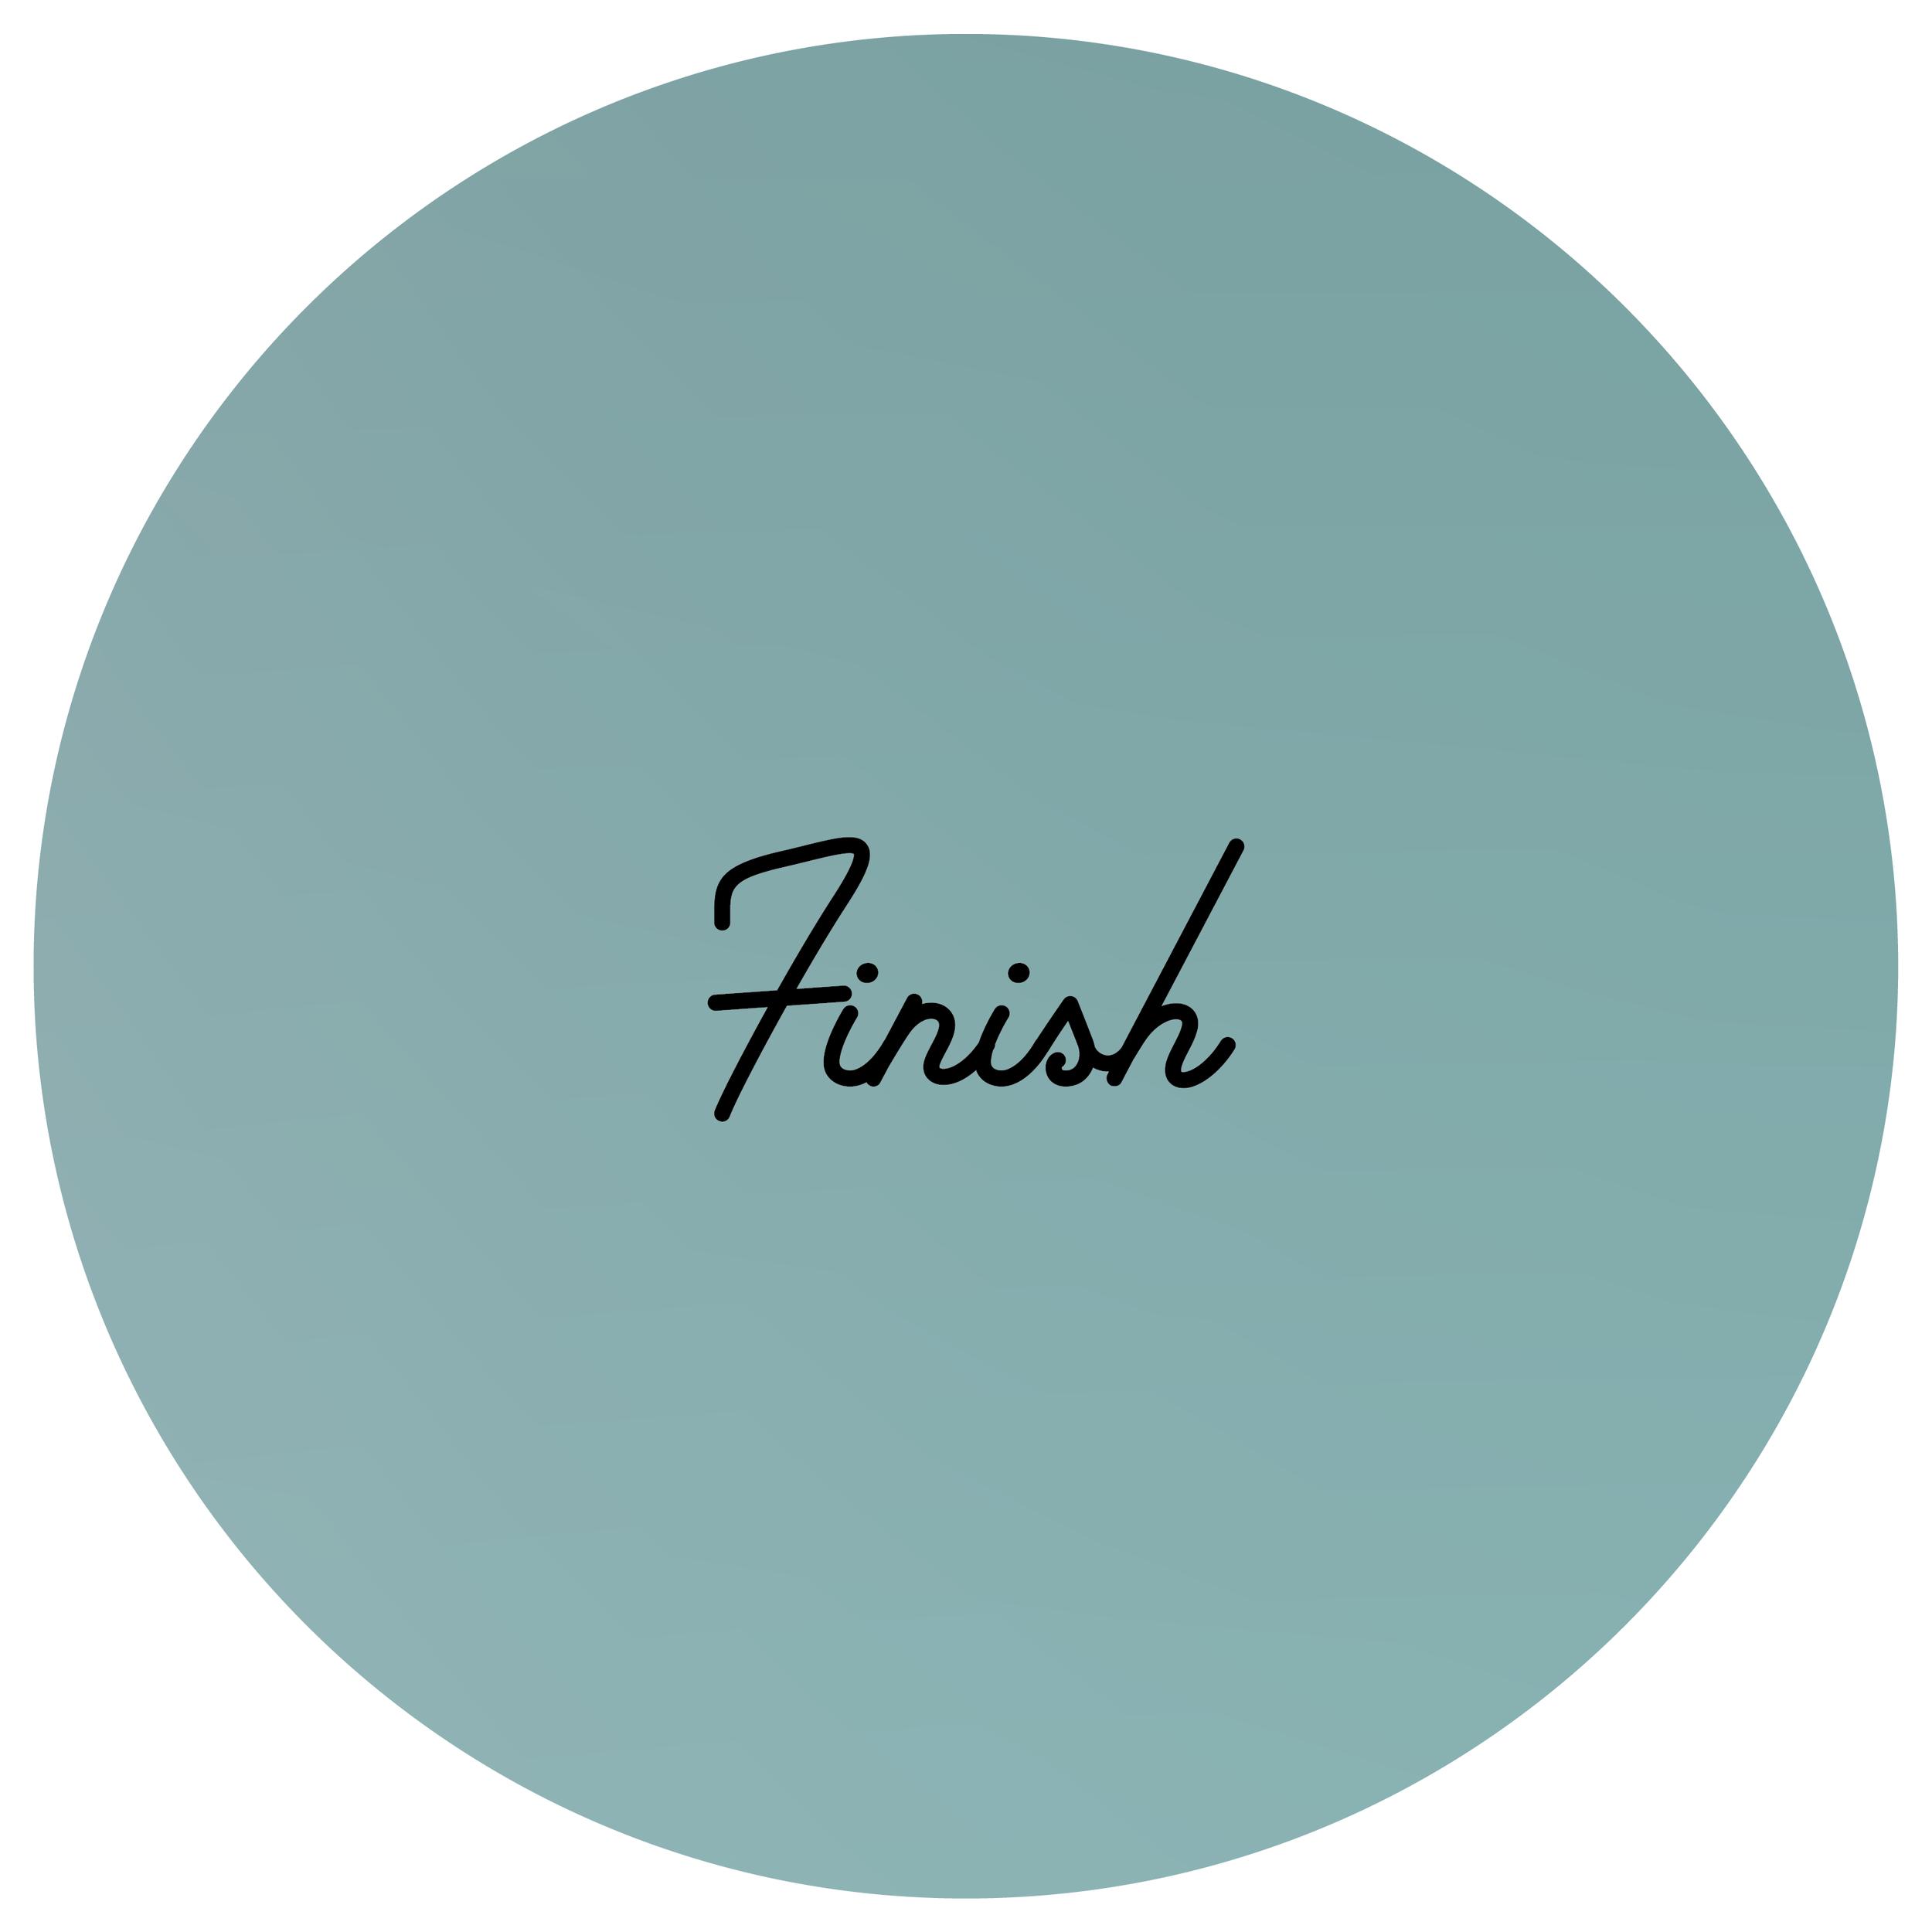 Process_circles-05.png